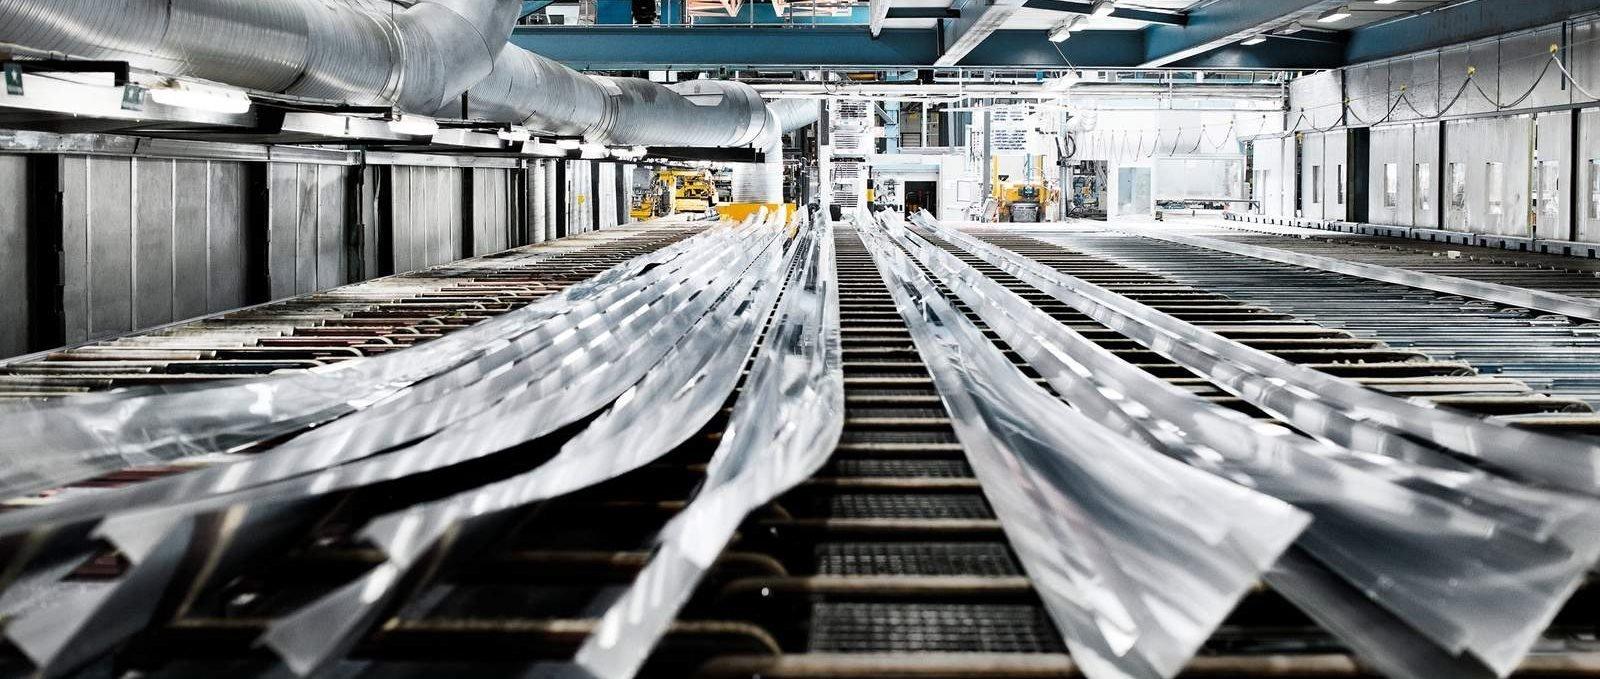 aluminium material cnc